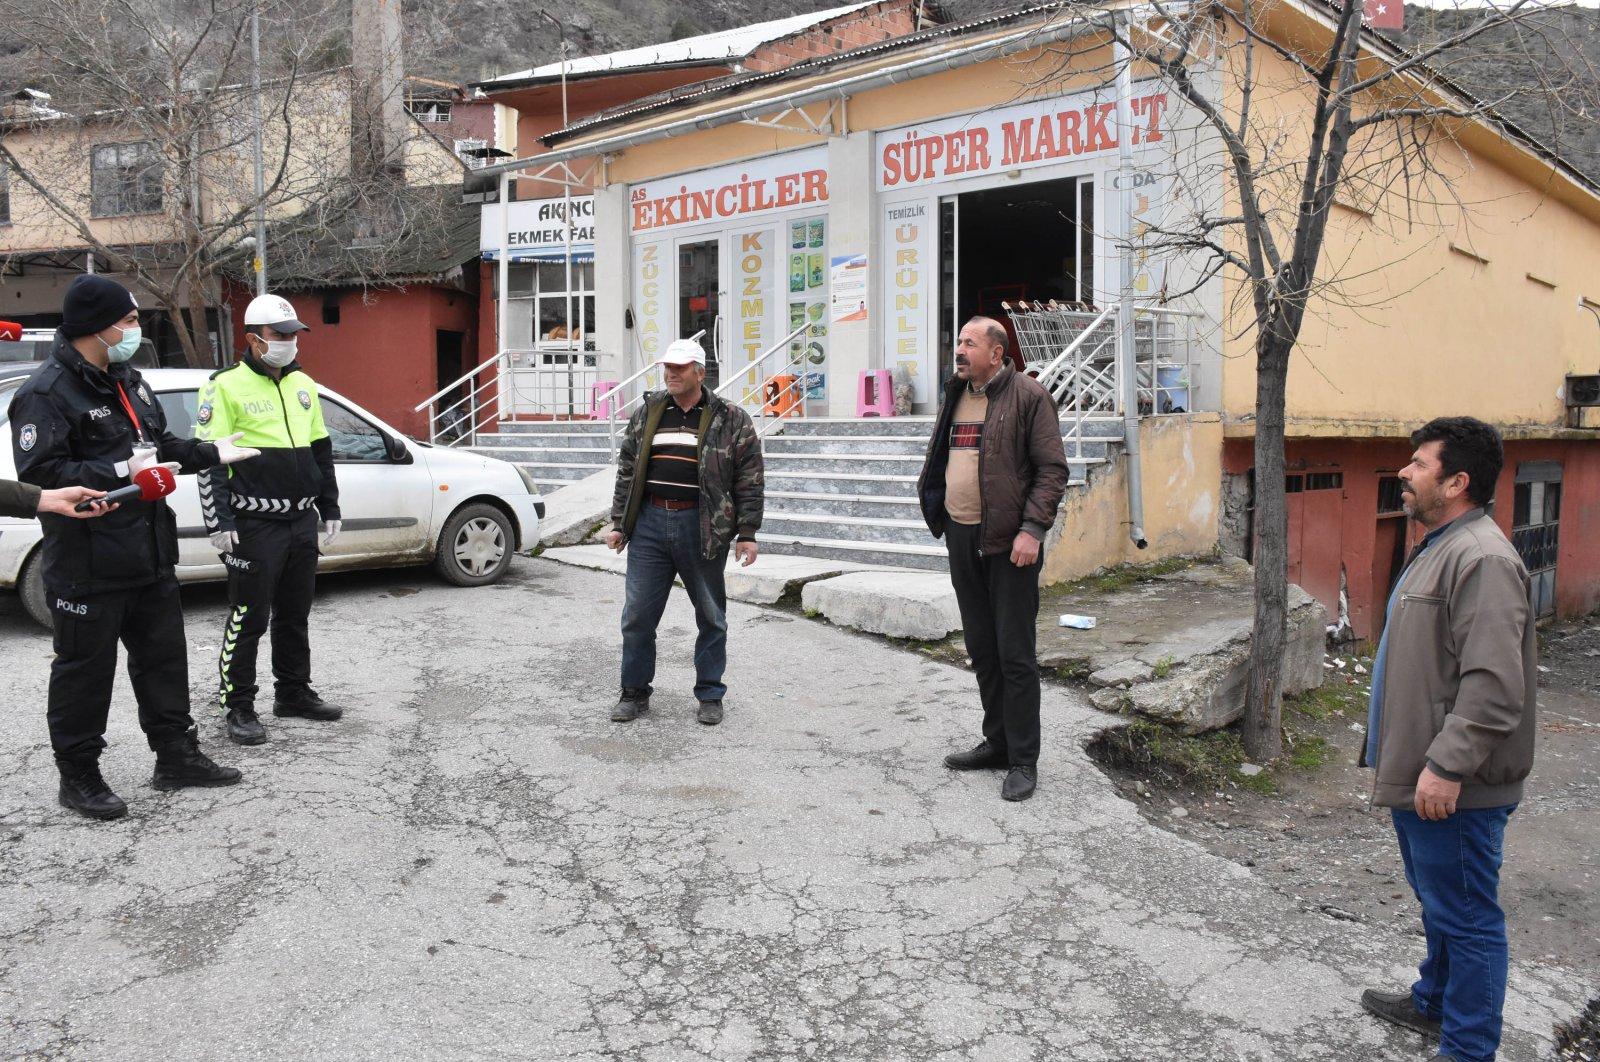 Police officers warn three men caught walking too close together, in Akıncılar, Sivas, Turkey, Wednesday, April 1, 2020. (DHA Photo)